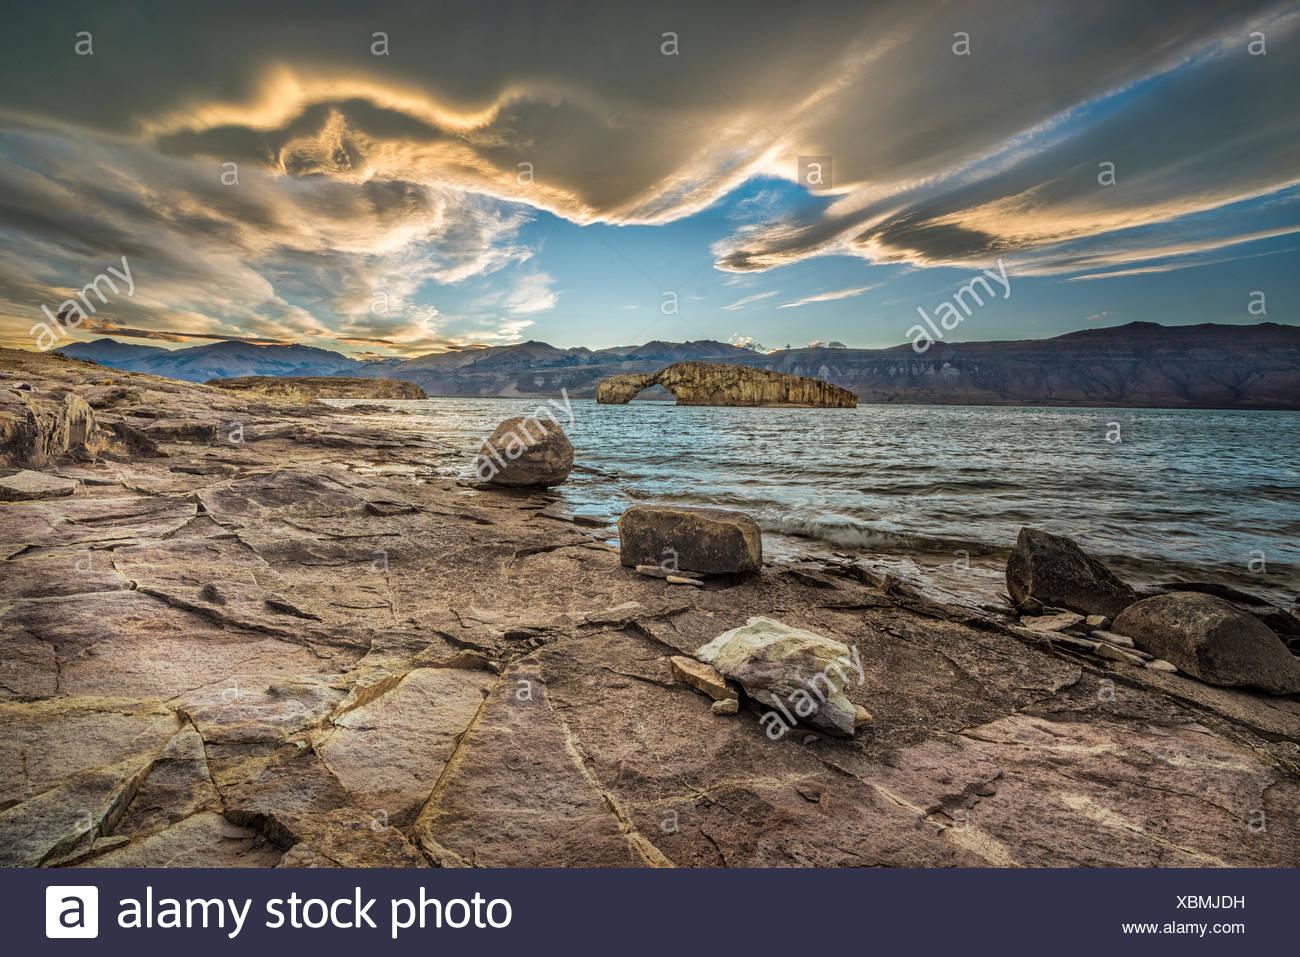 South America,Argentina,Santa Cruz,Patagonia,Lago Posadas,sunset,at Lago Posadas Stock Photo